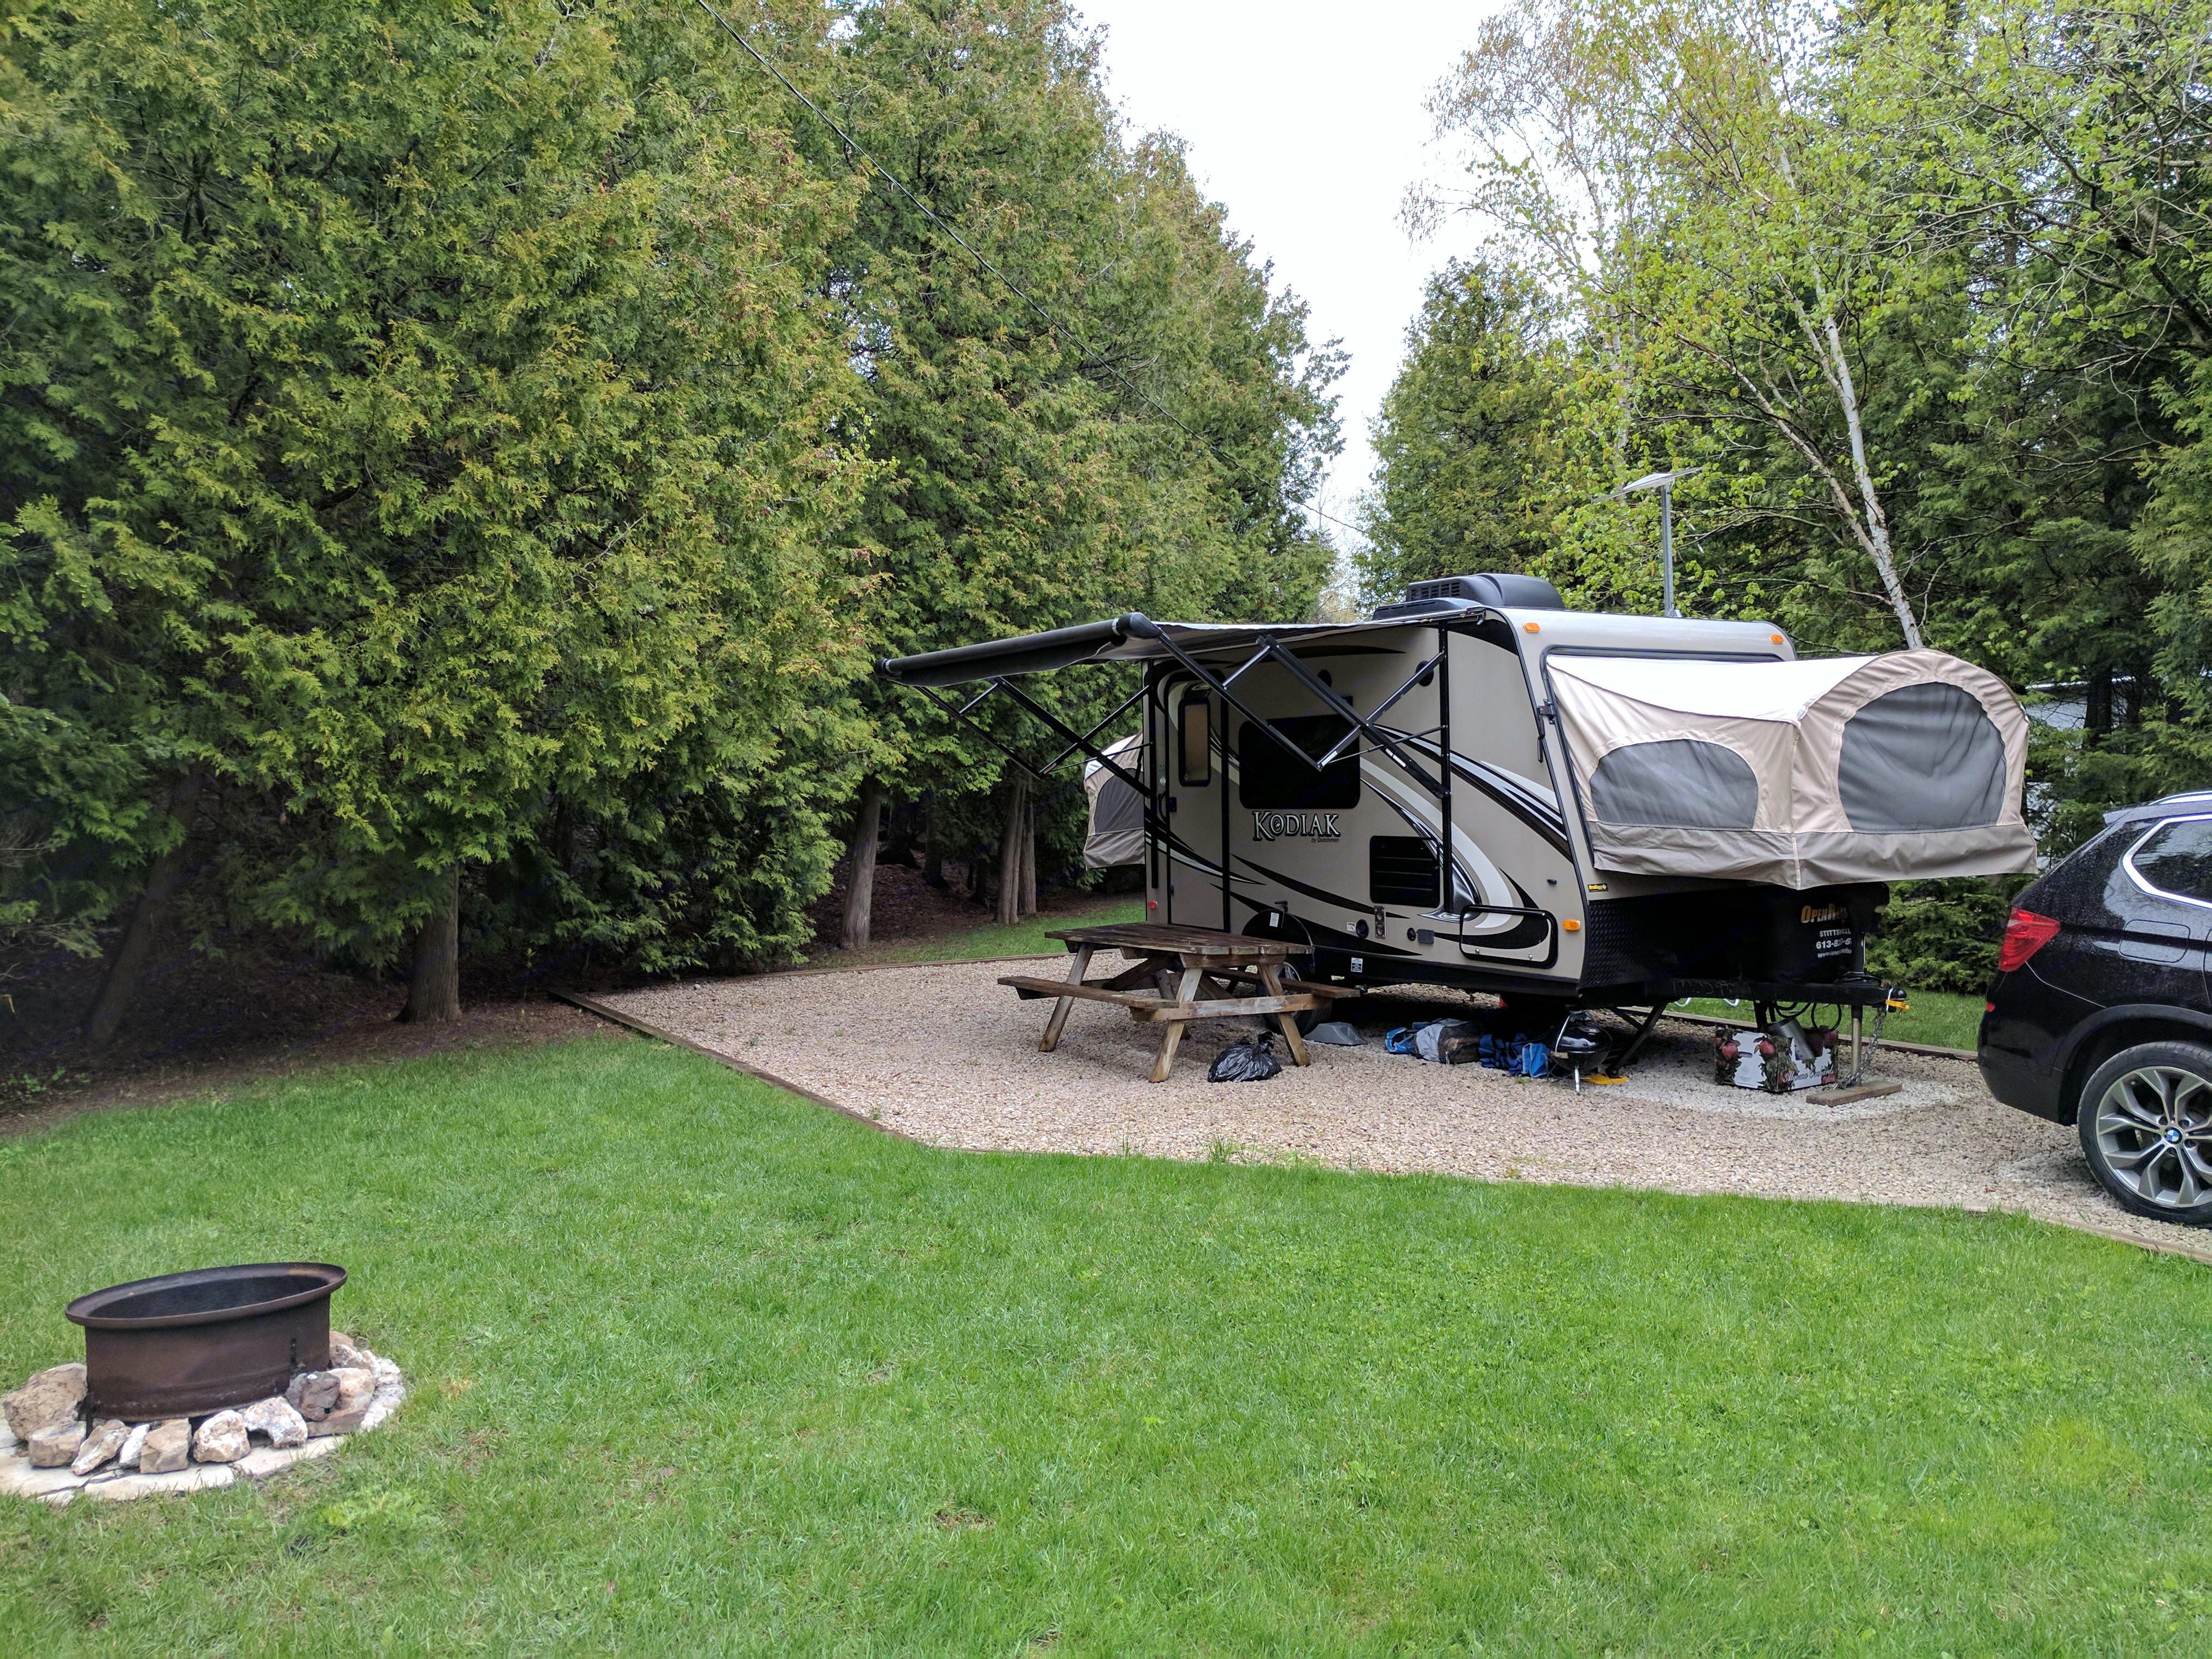 All setup for some camping fun!. Dutchmen Kodiak 2013